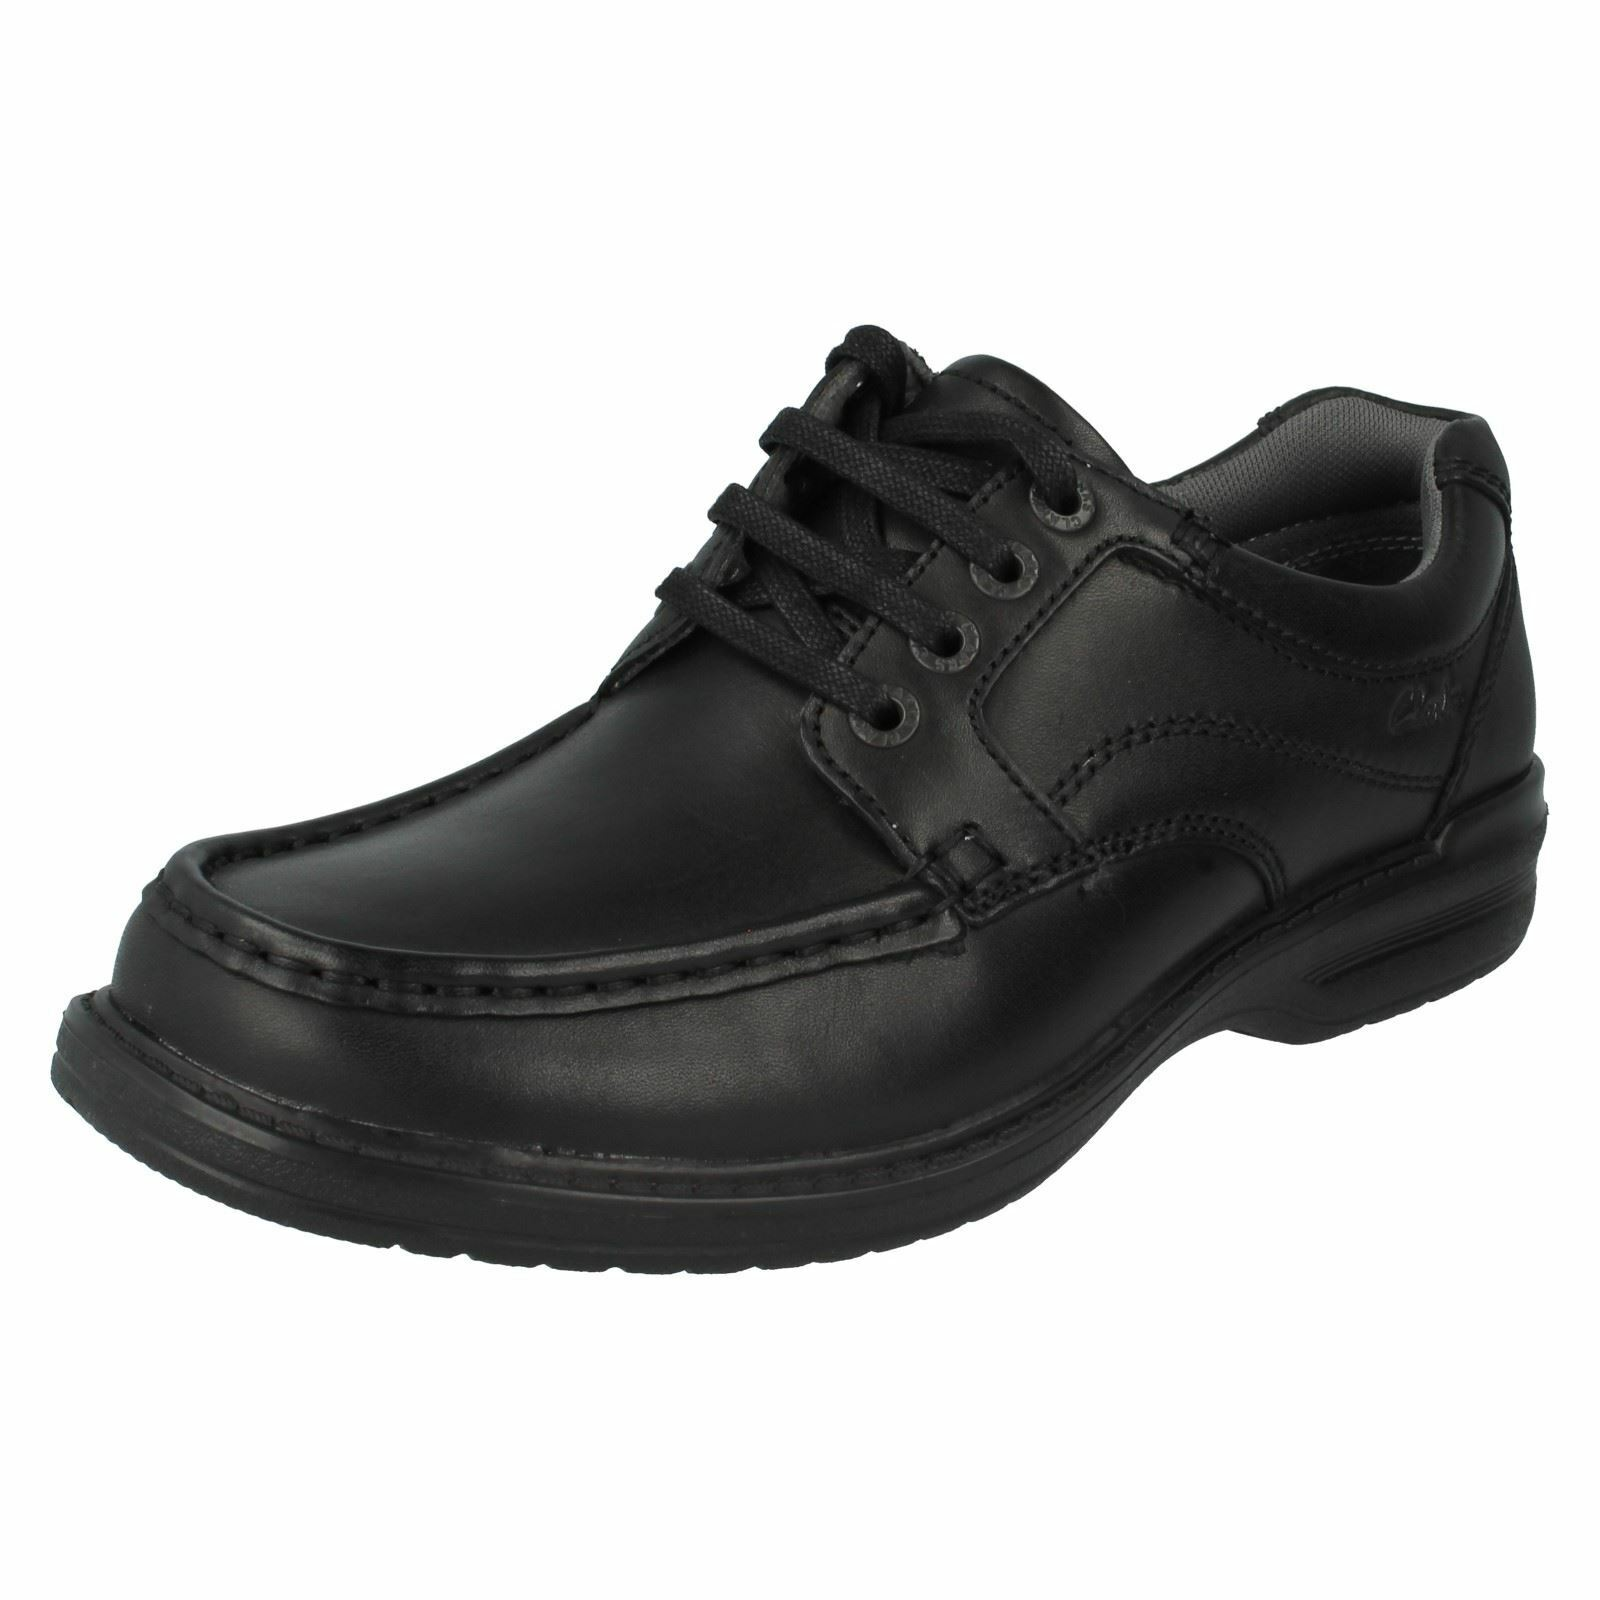 Clarks Hombre Keeler Zapatos de cuero  Keeler Hombre ANDAR ead431